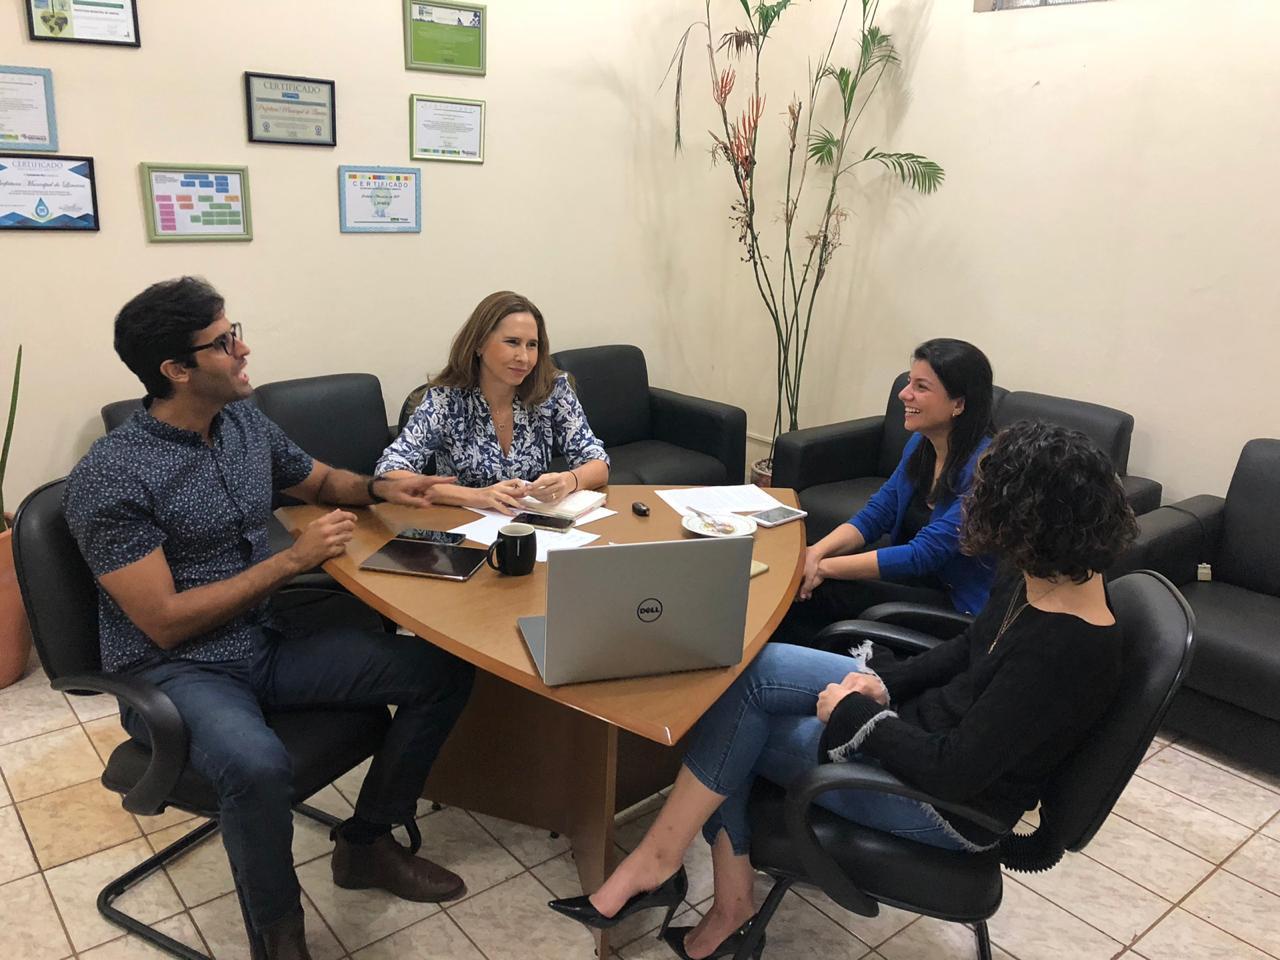 Voluntariado no Canil Municipal de Limeira é tema de conversas